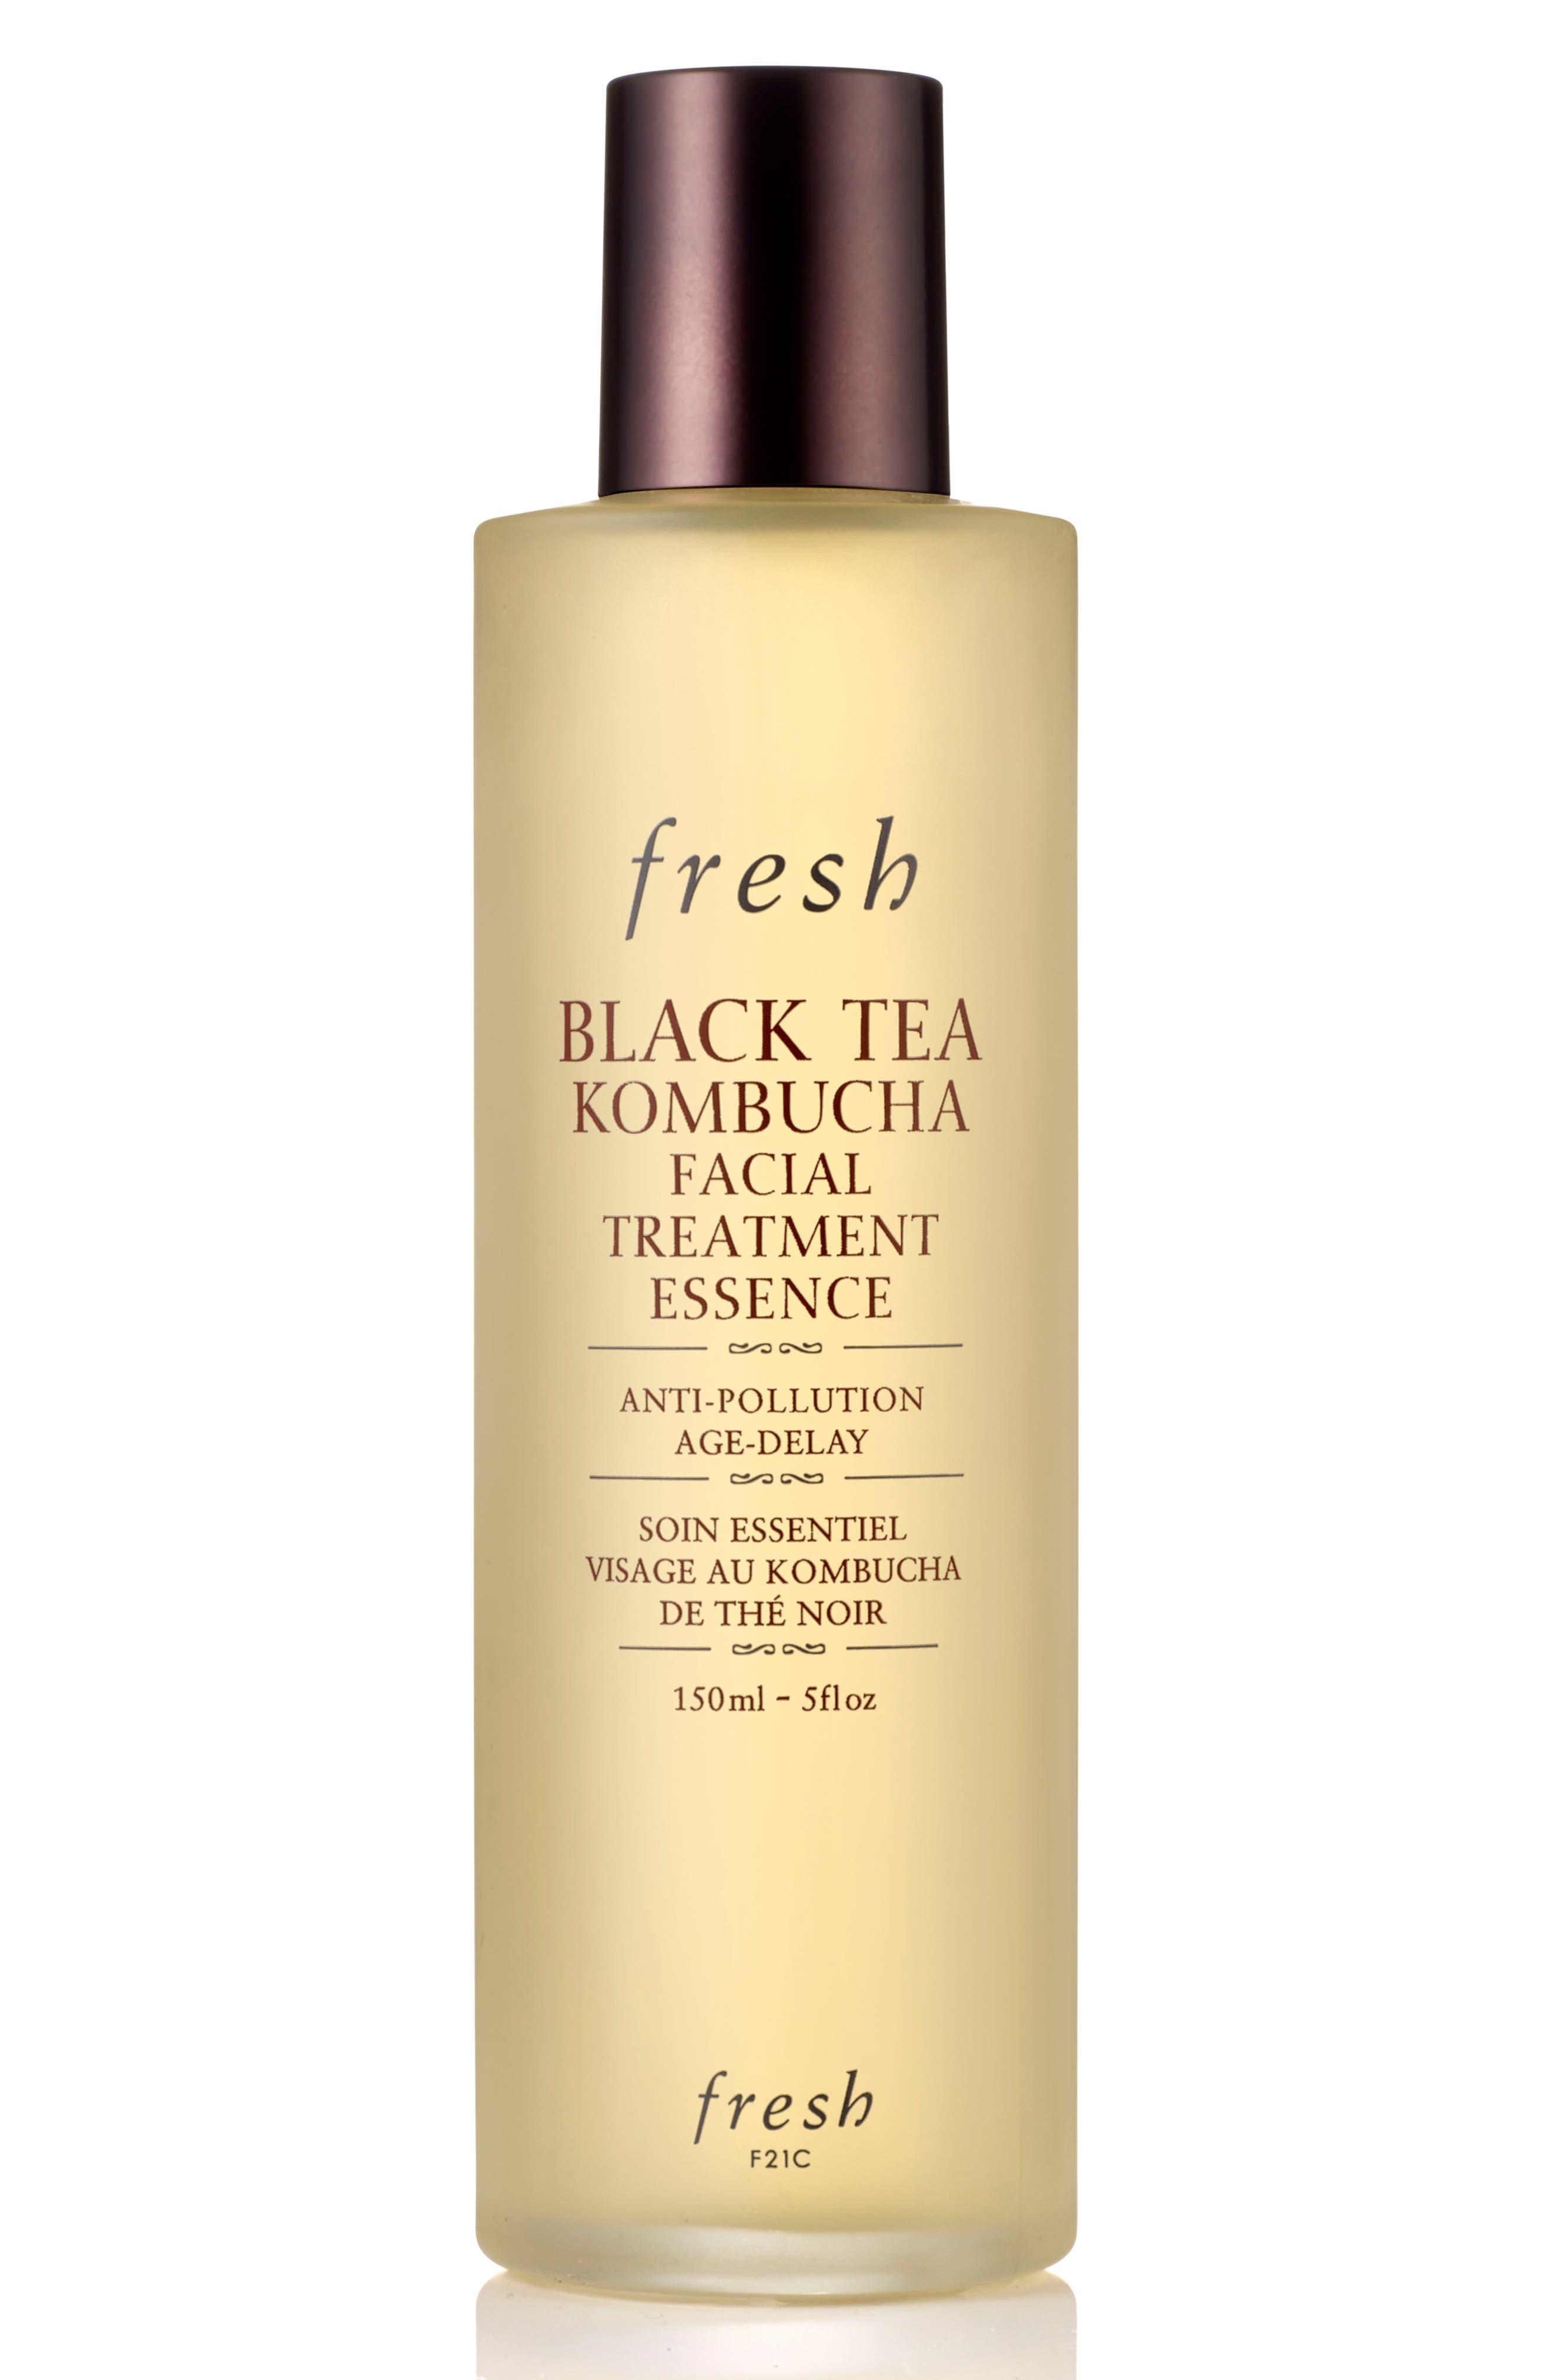 Fresh® Black Tea Kombucha Facial Treatment Essence